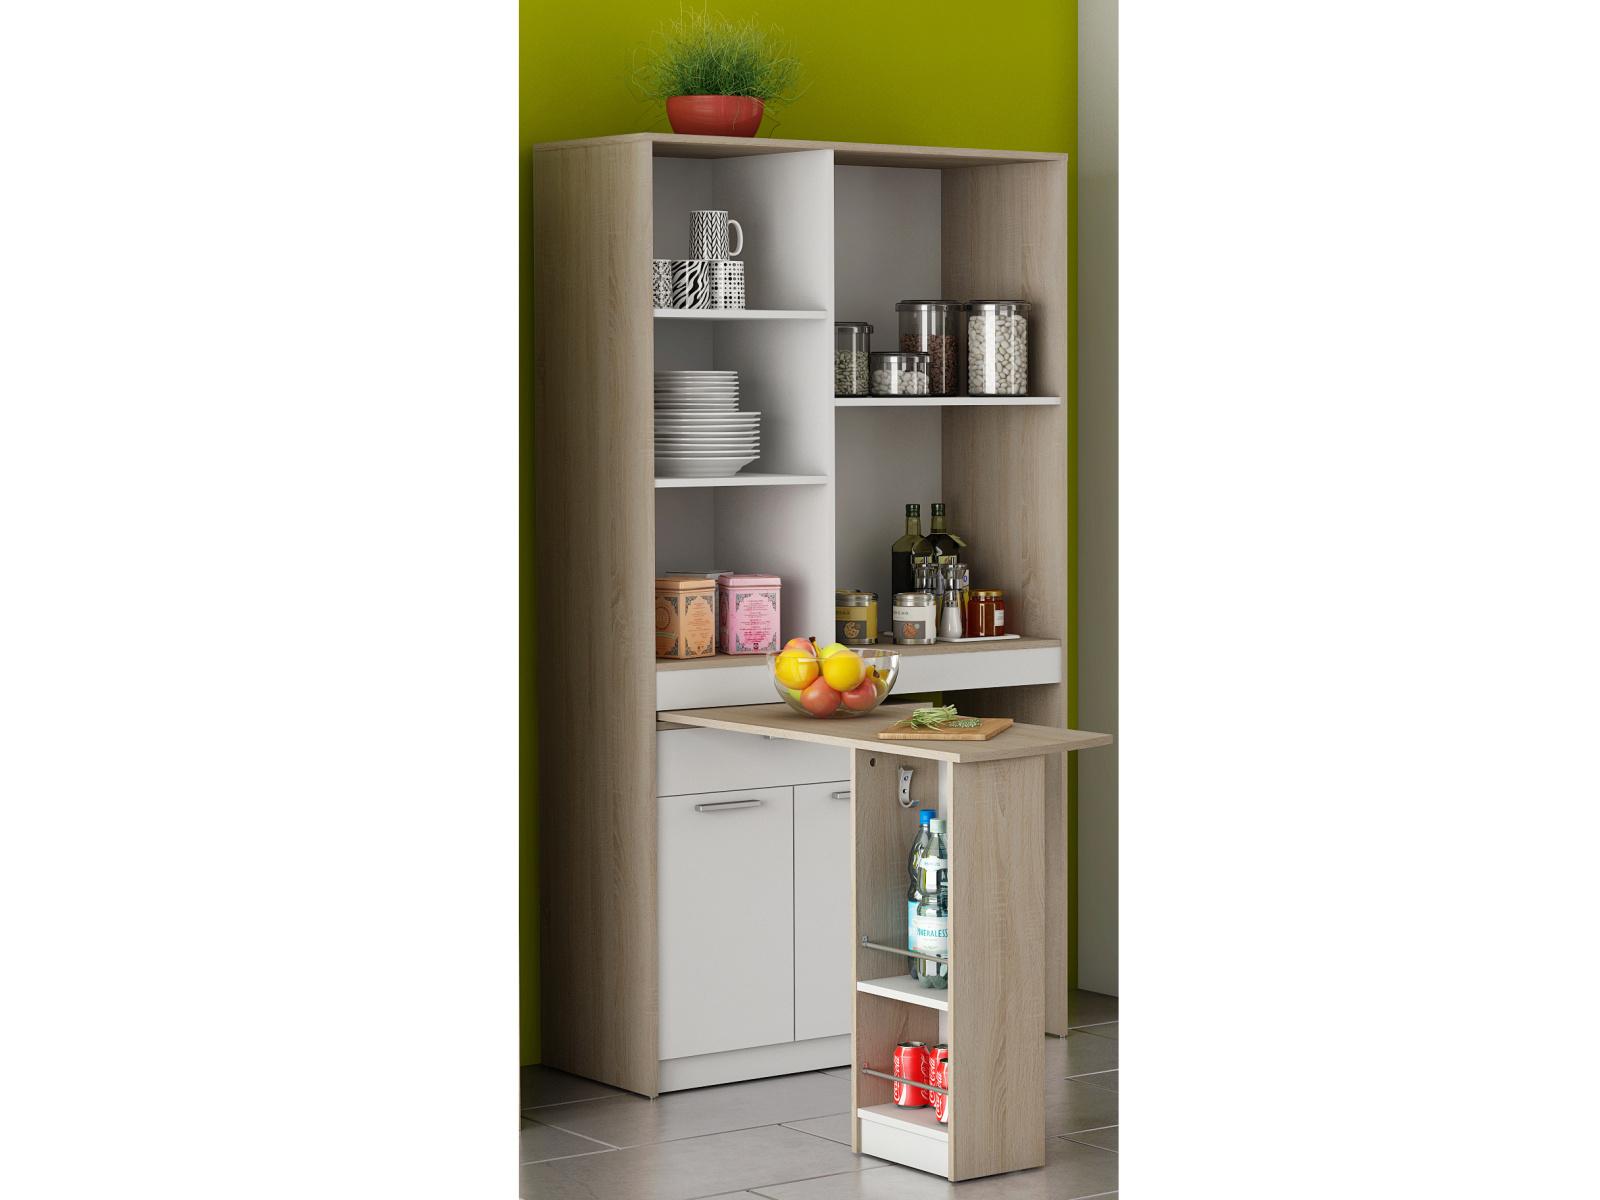 DEMEYERE URBEN kuchyňská skříňka se stolem, dub sonoma/bílá